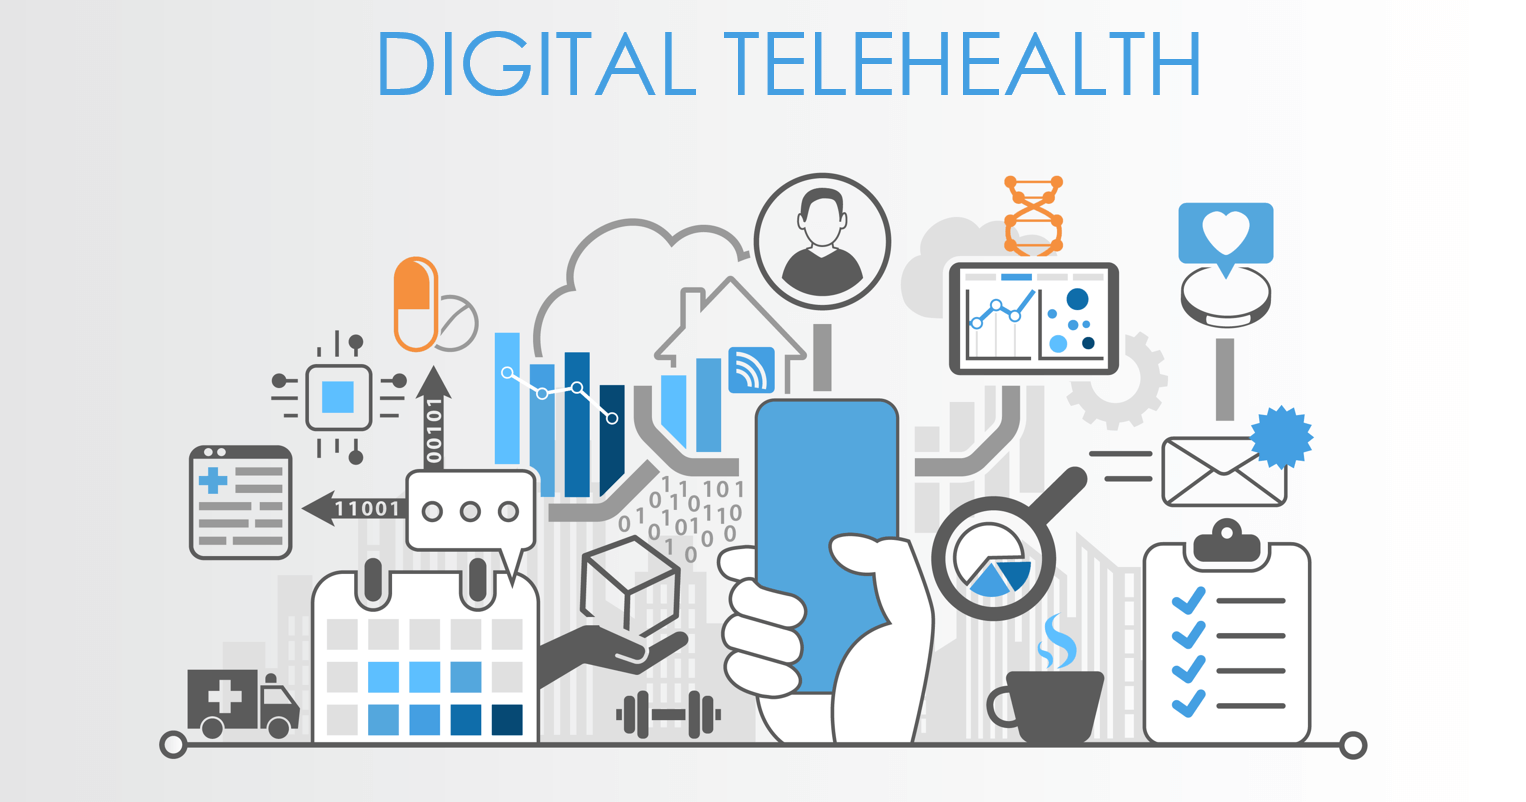 Digital Telehealth